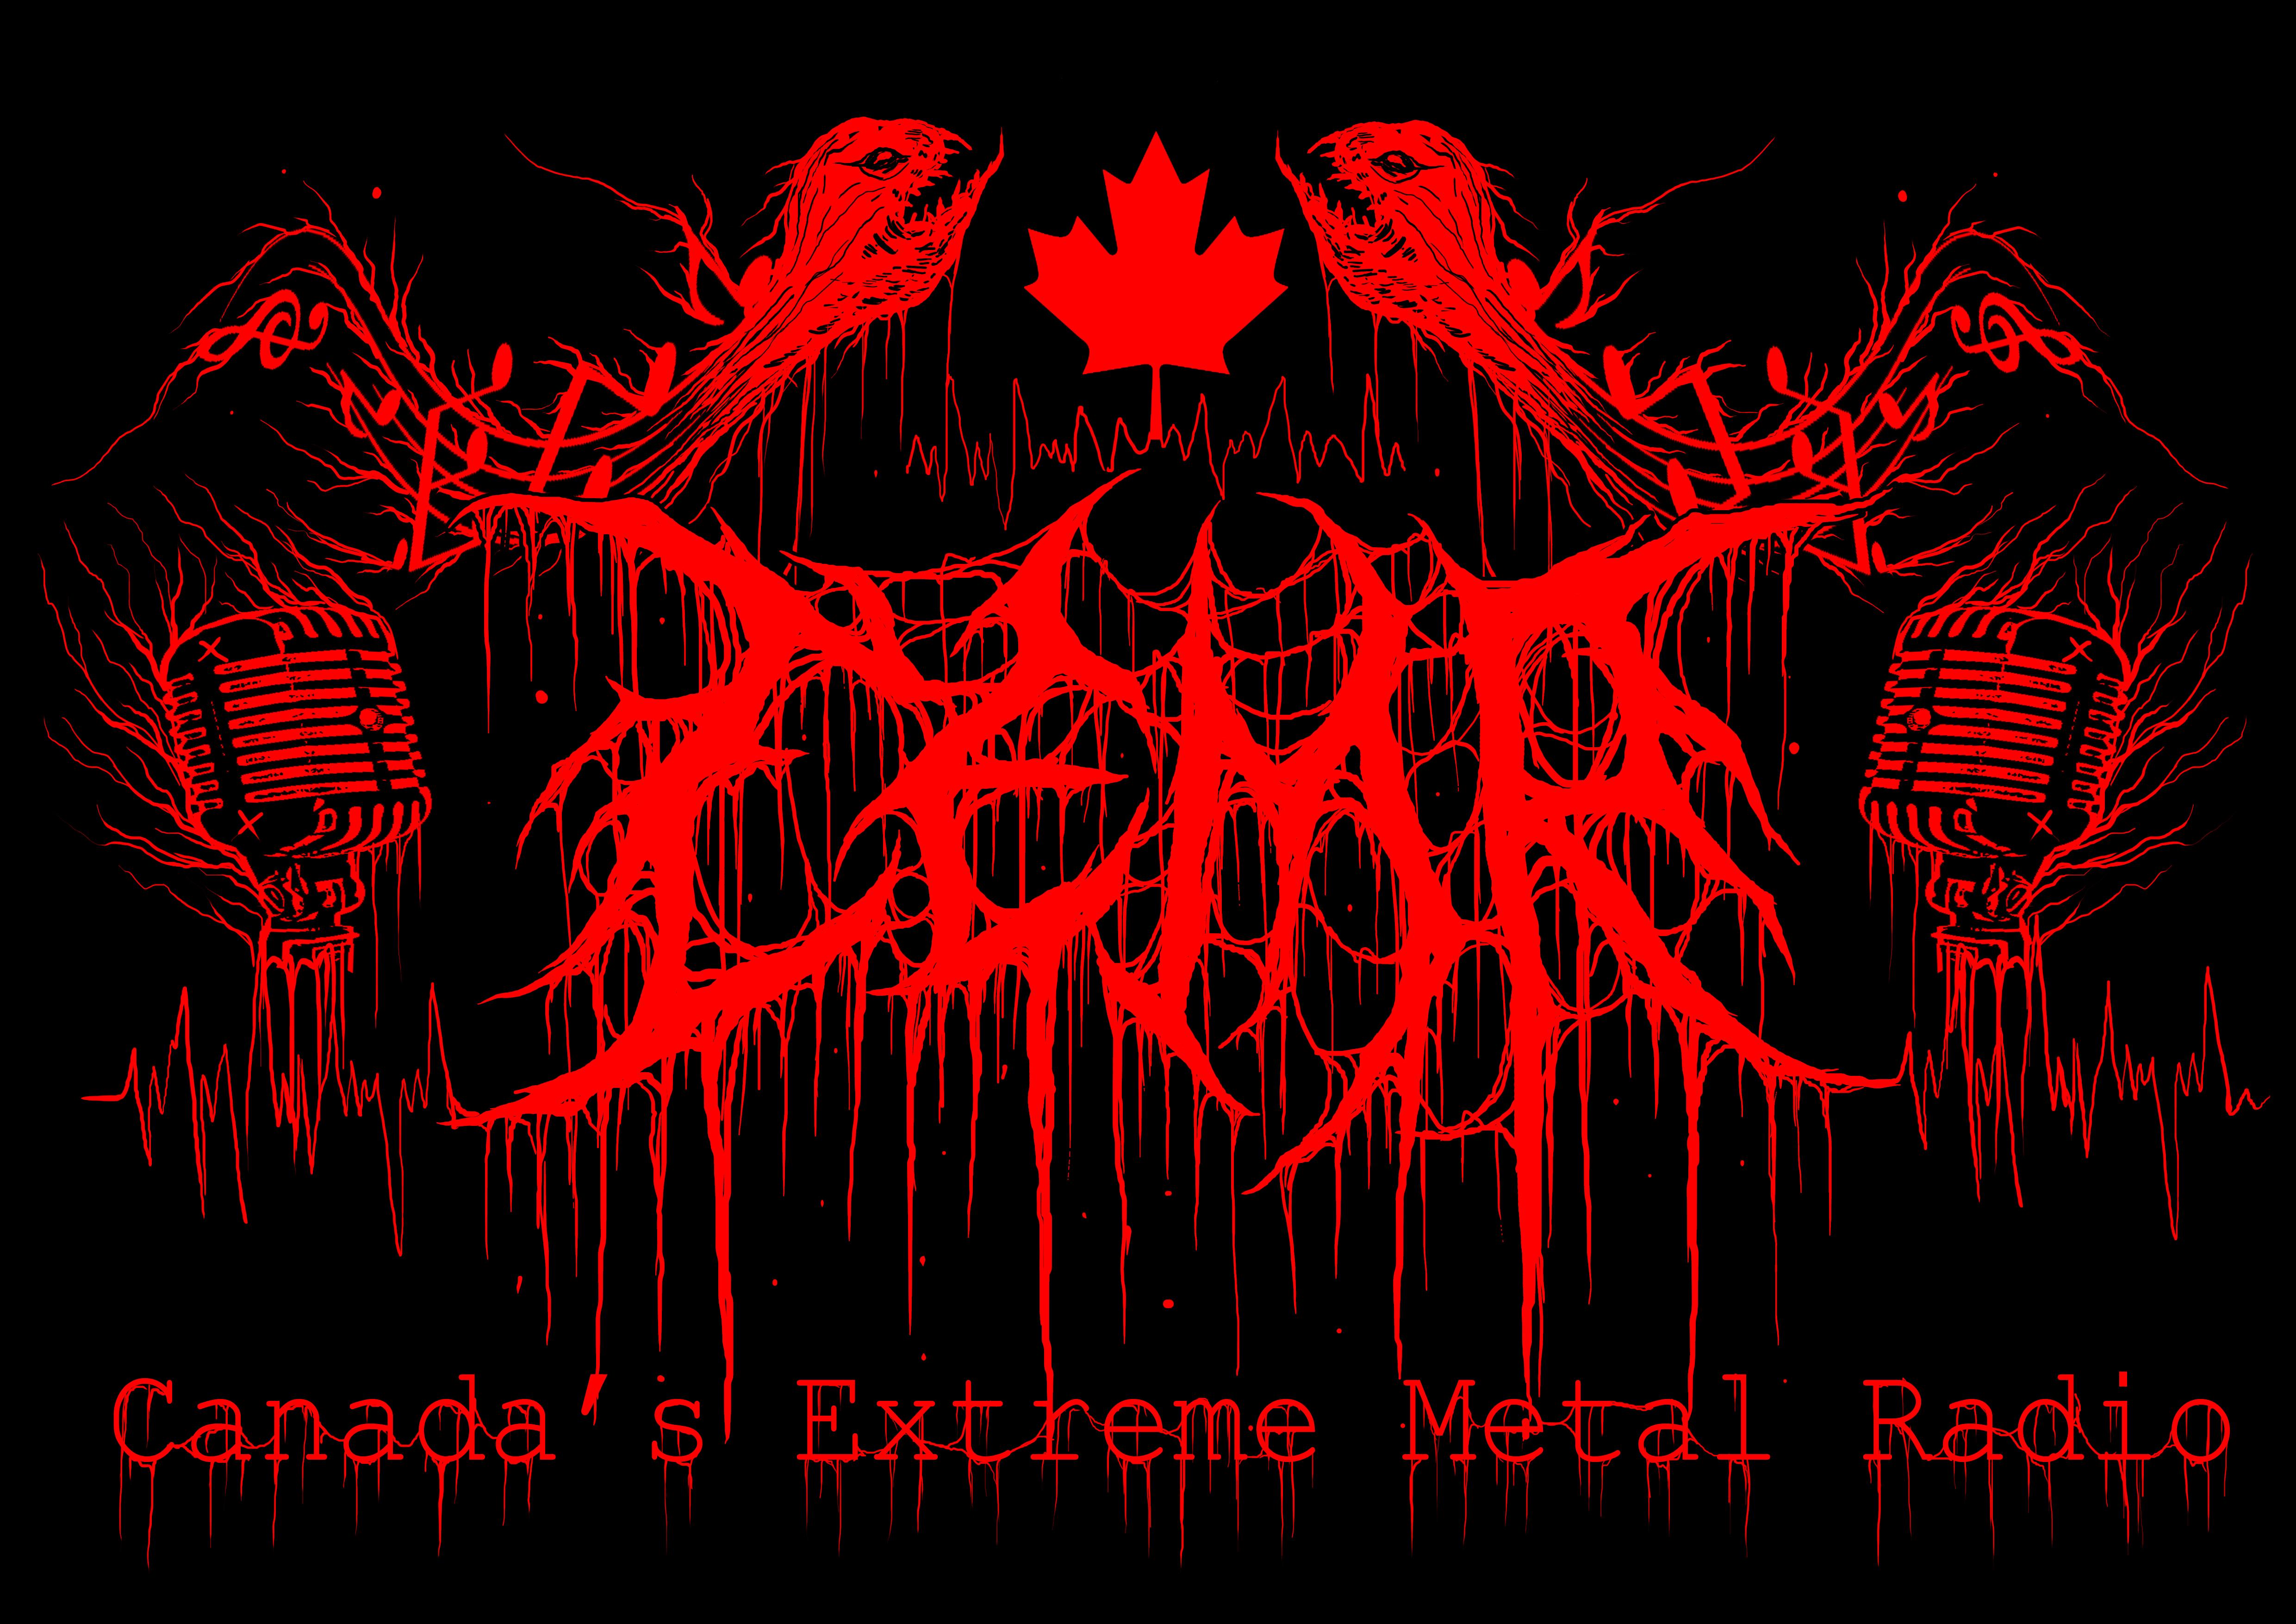 Canada's Extreme Metal Radio logo